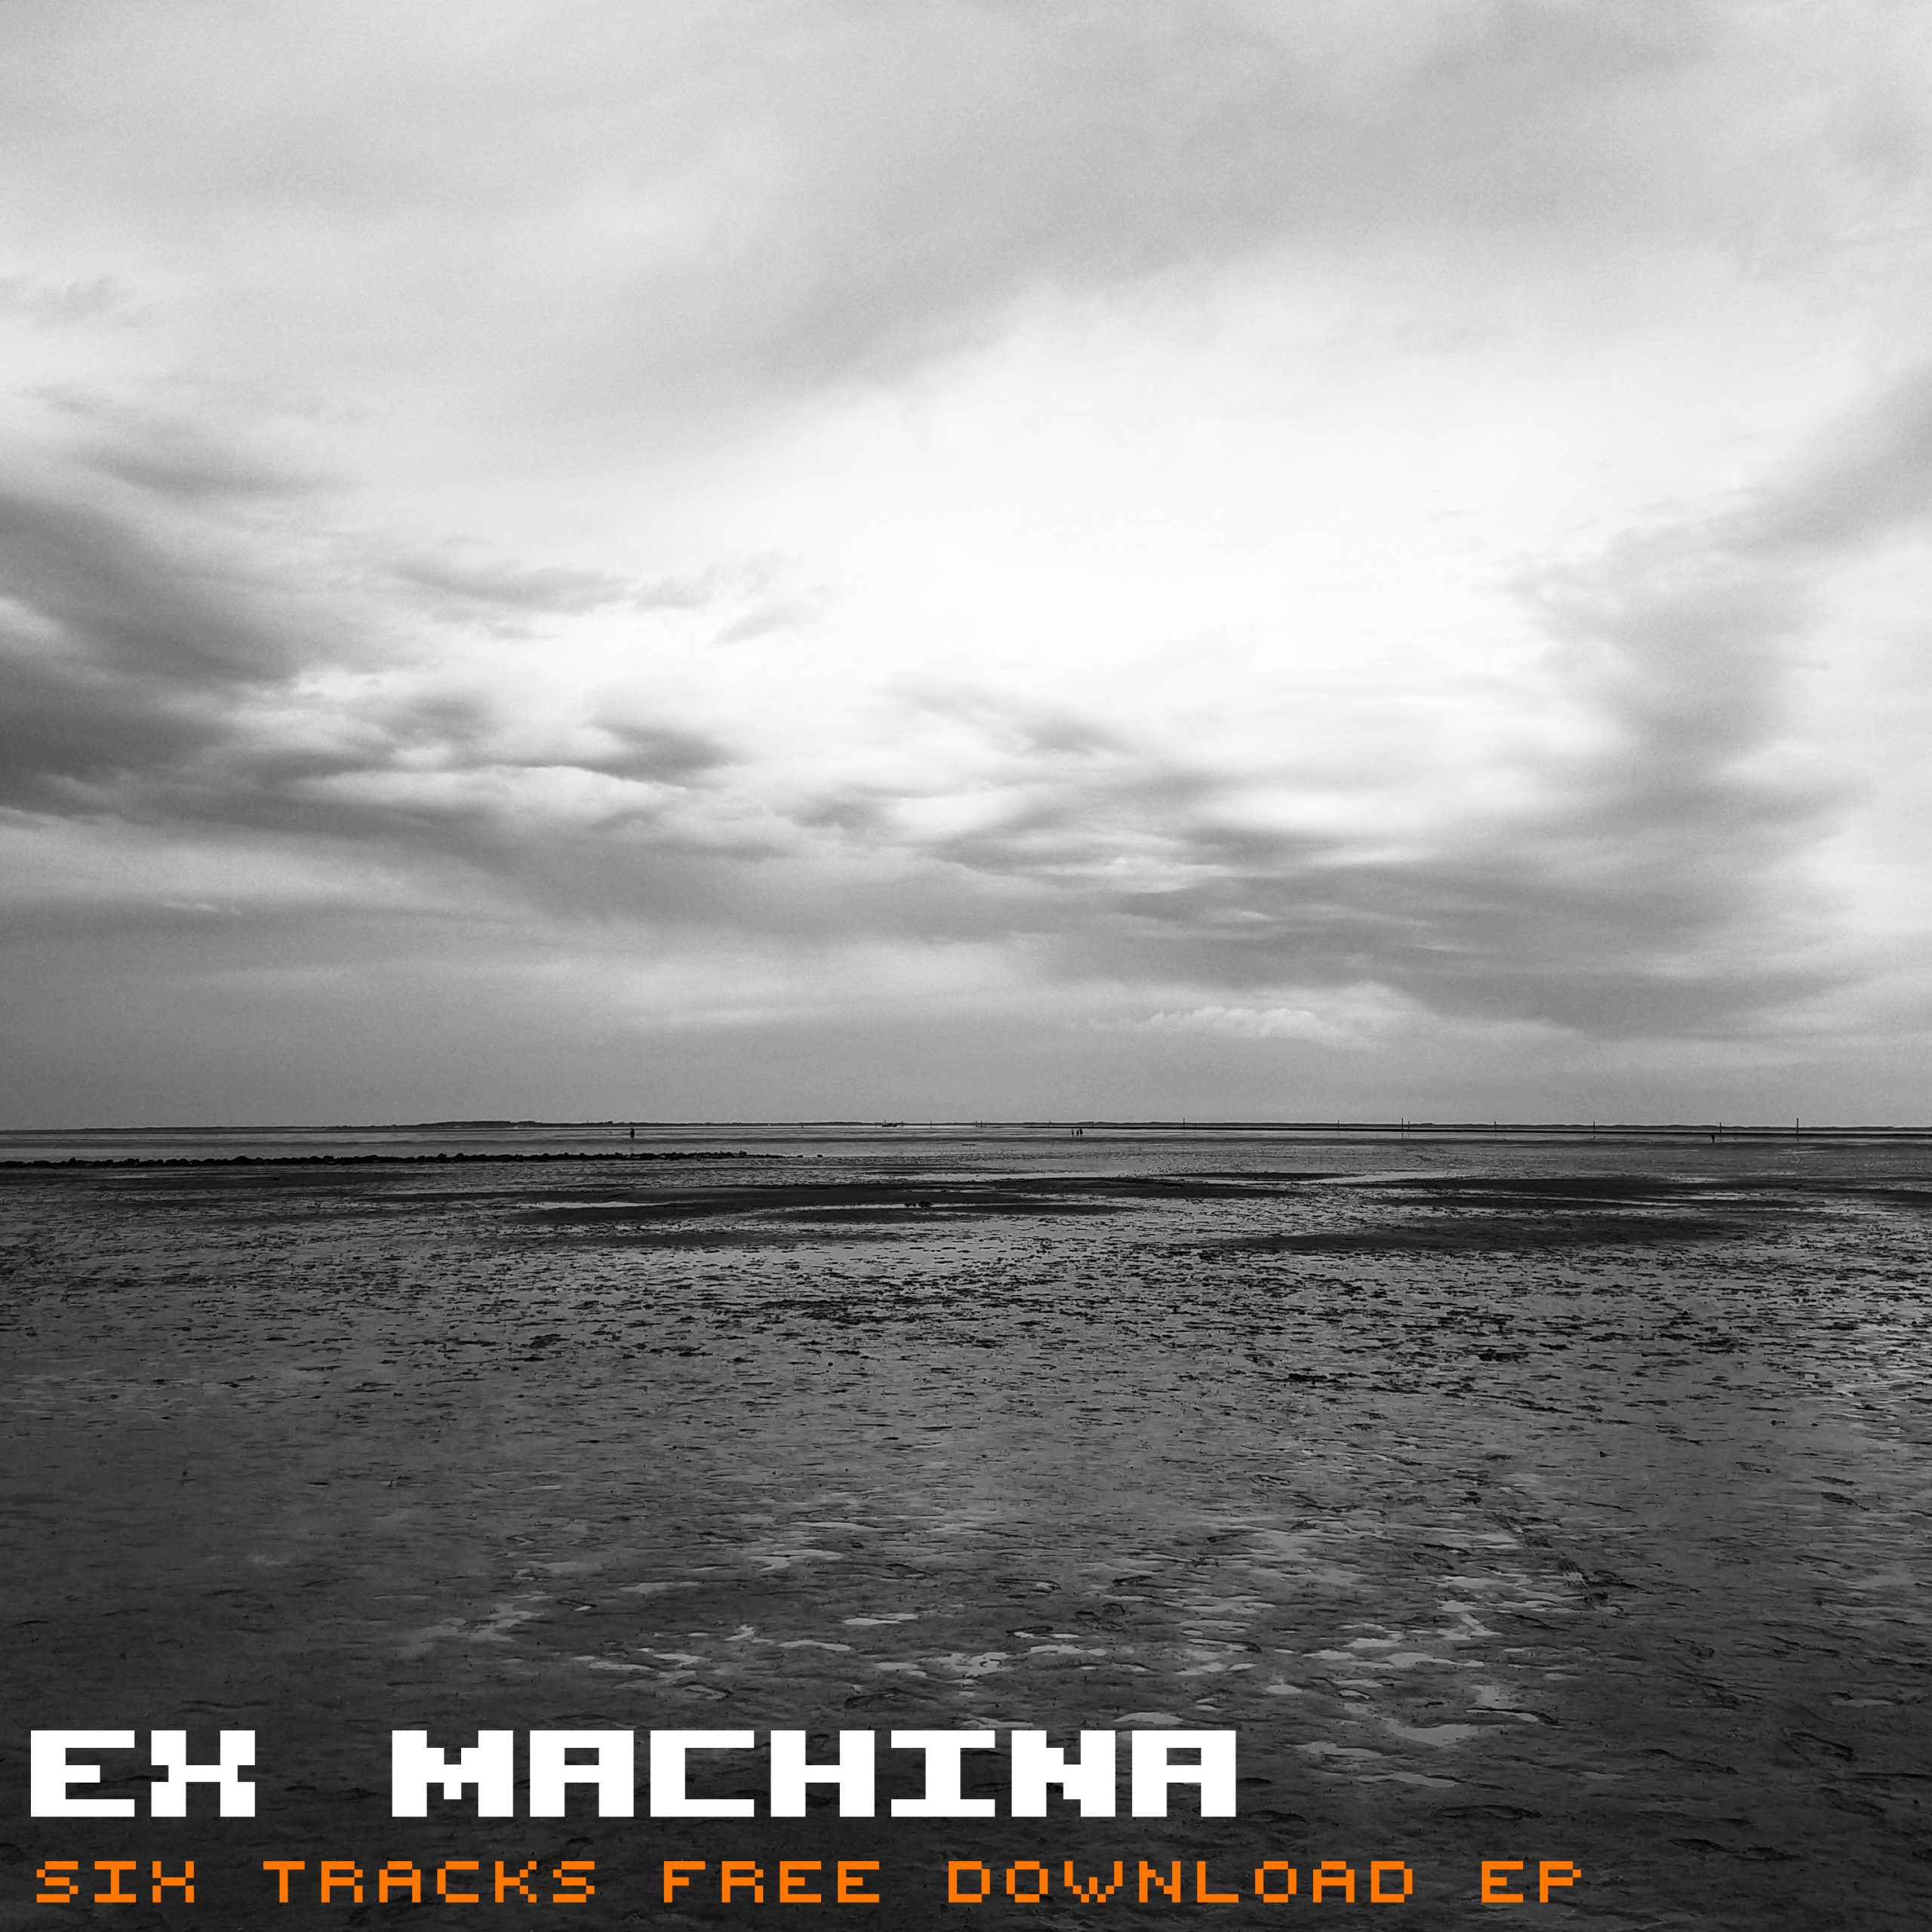 ex machina - free download ep artwork